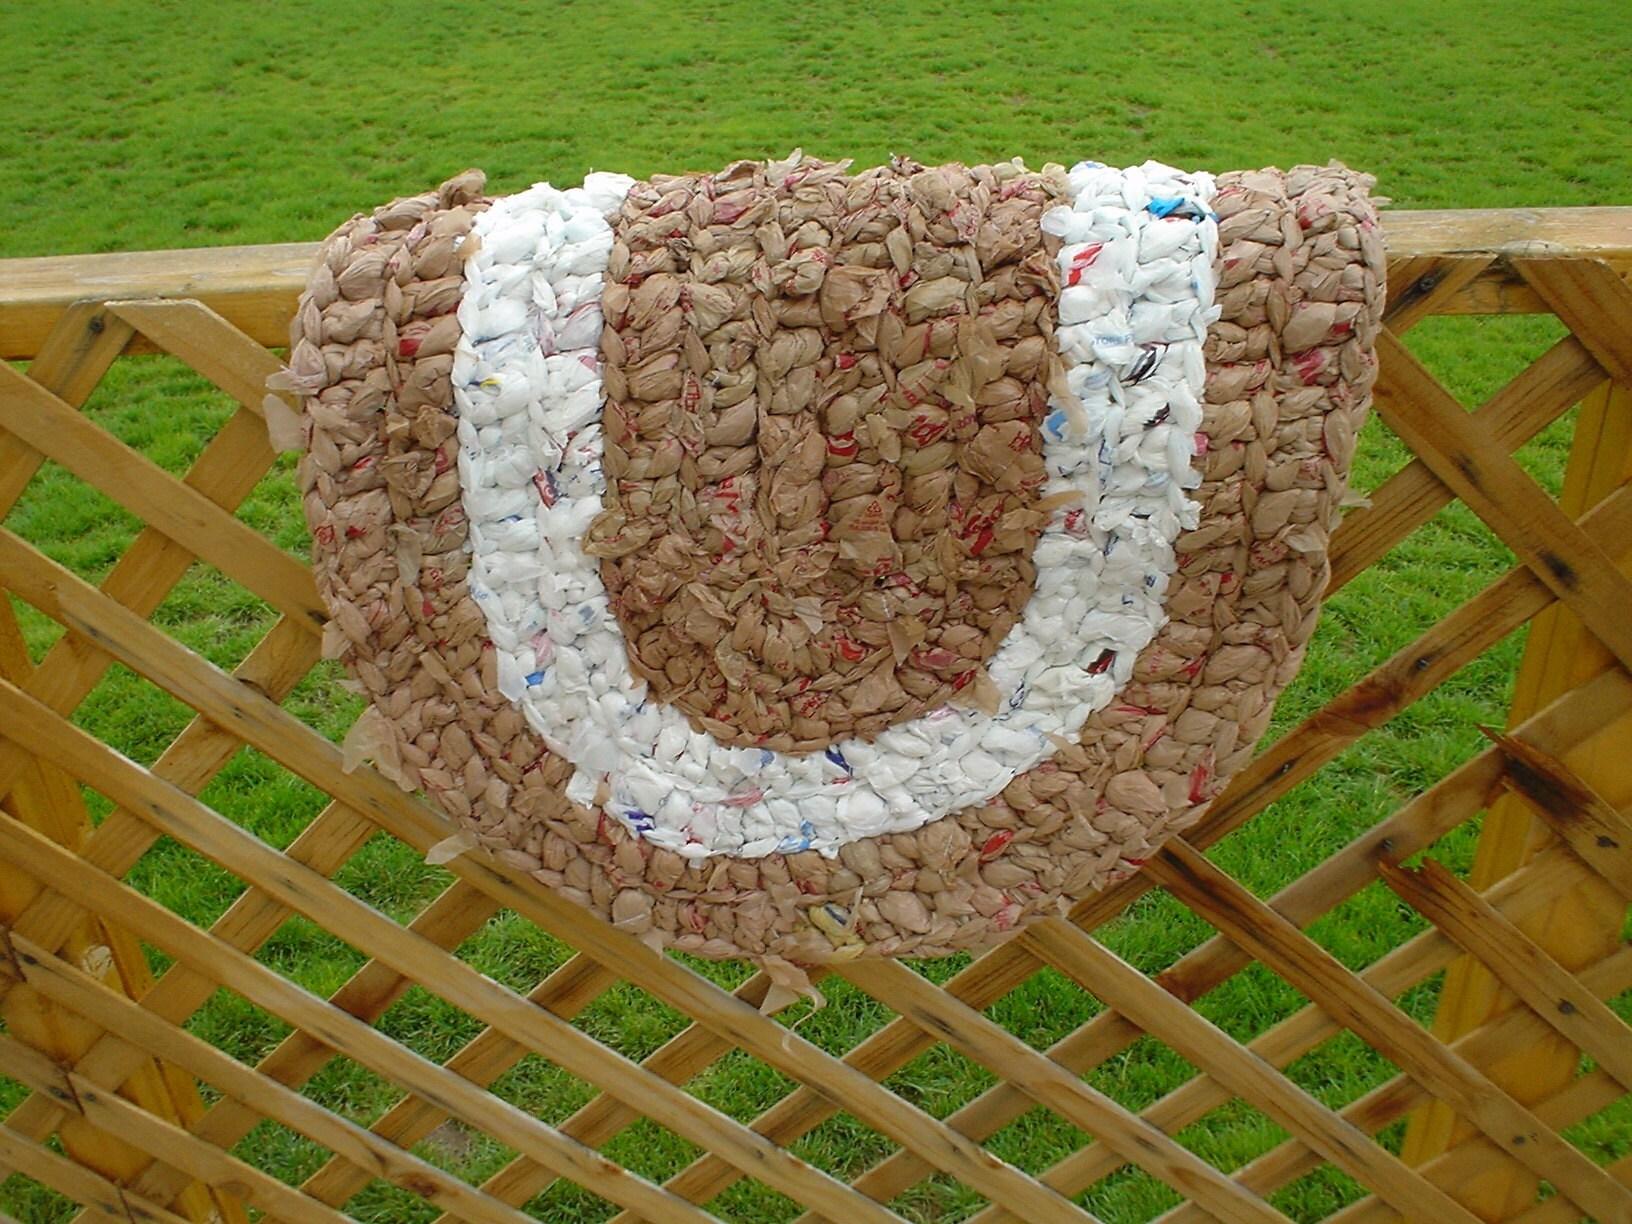 Recycled Plastic Bag Crocheted Rag Rug A